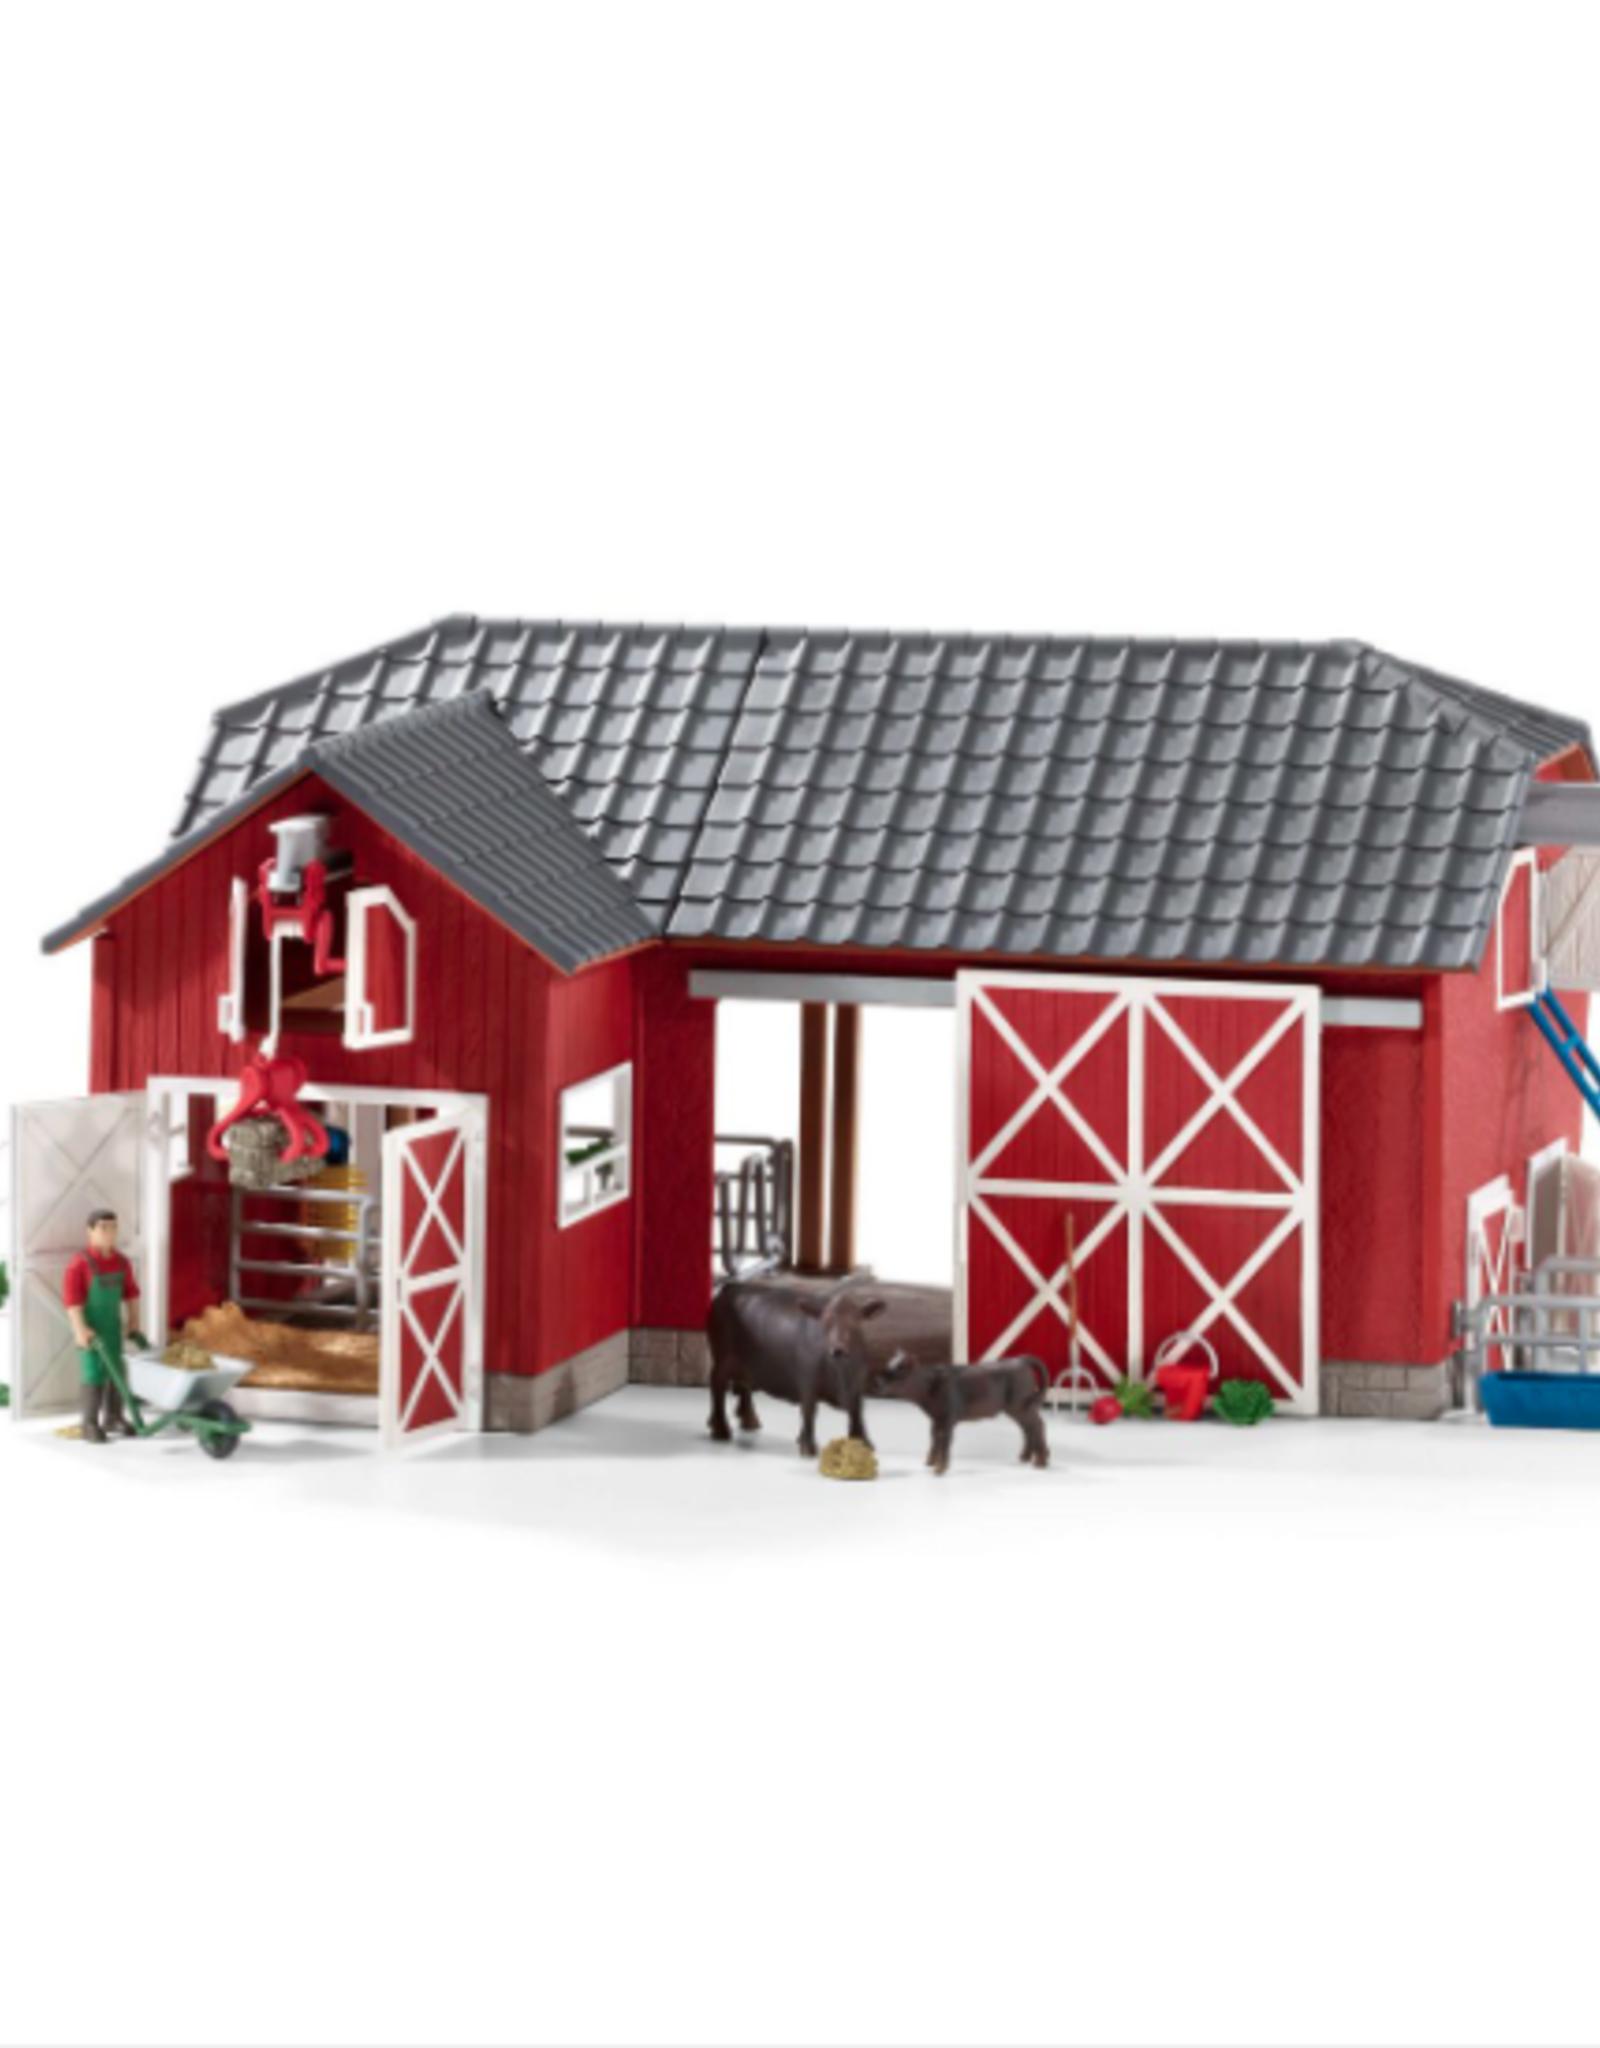 Schleich Schleich Large Red Barn with Animals and Accessories